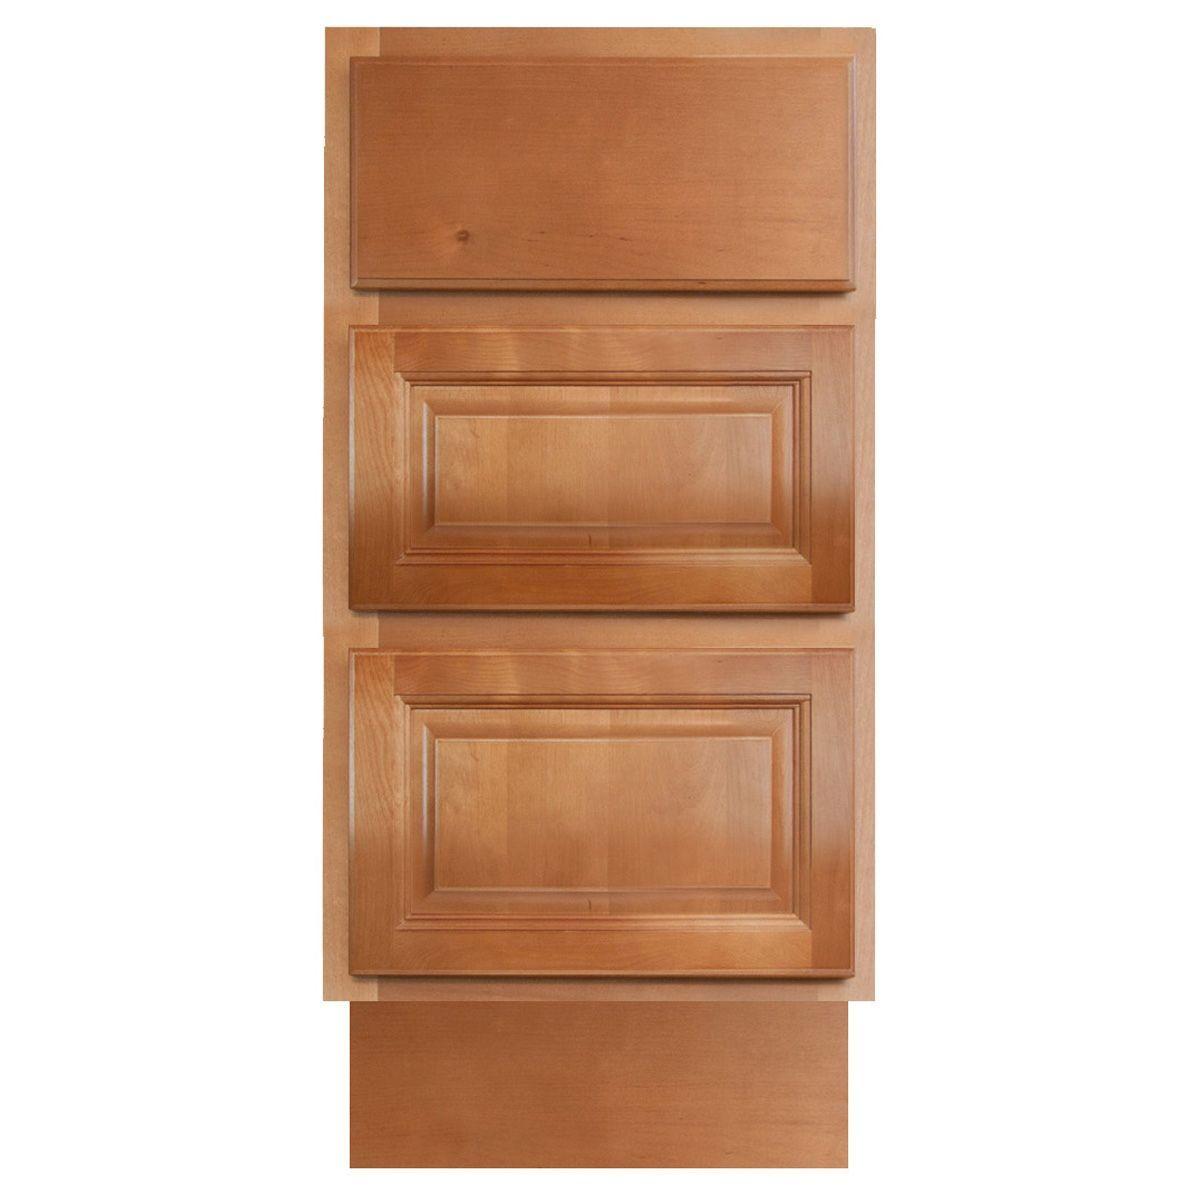 Kitchen Cabinets Richmond Va: LessCare Richmond 10 X 10 Kitchen